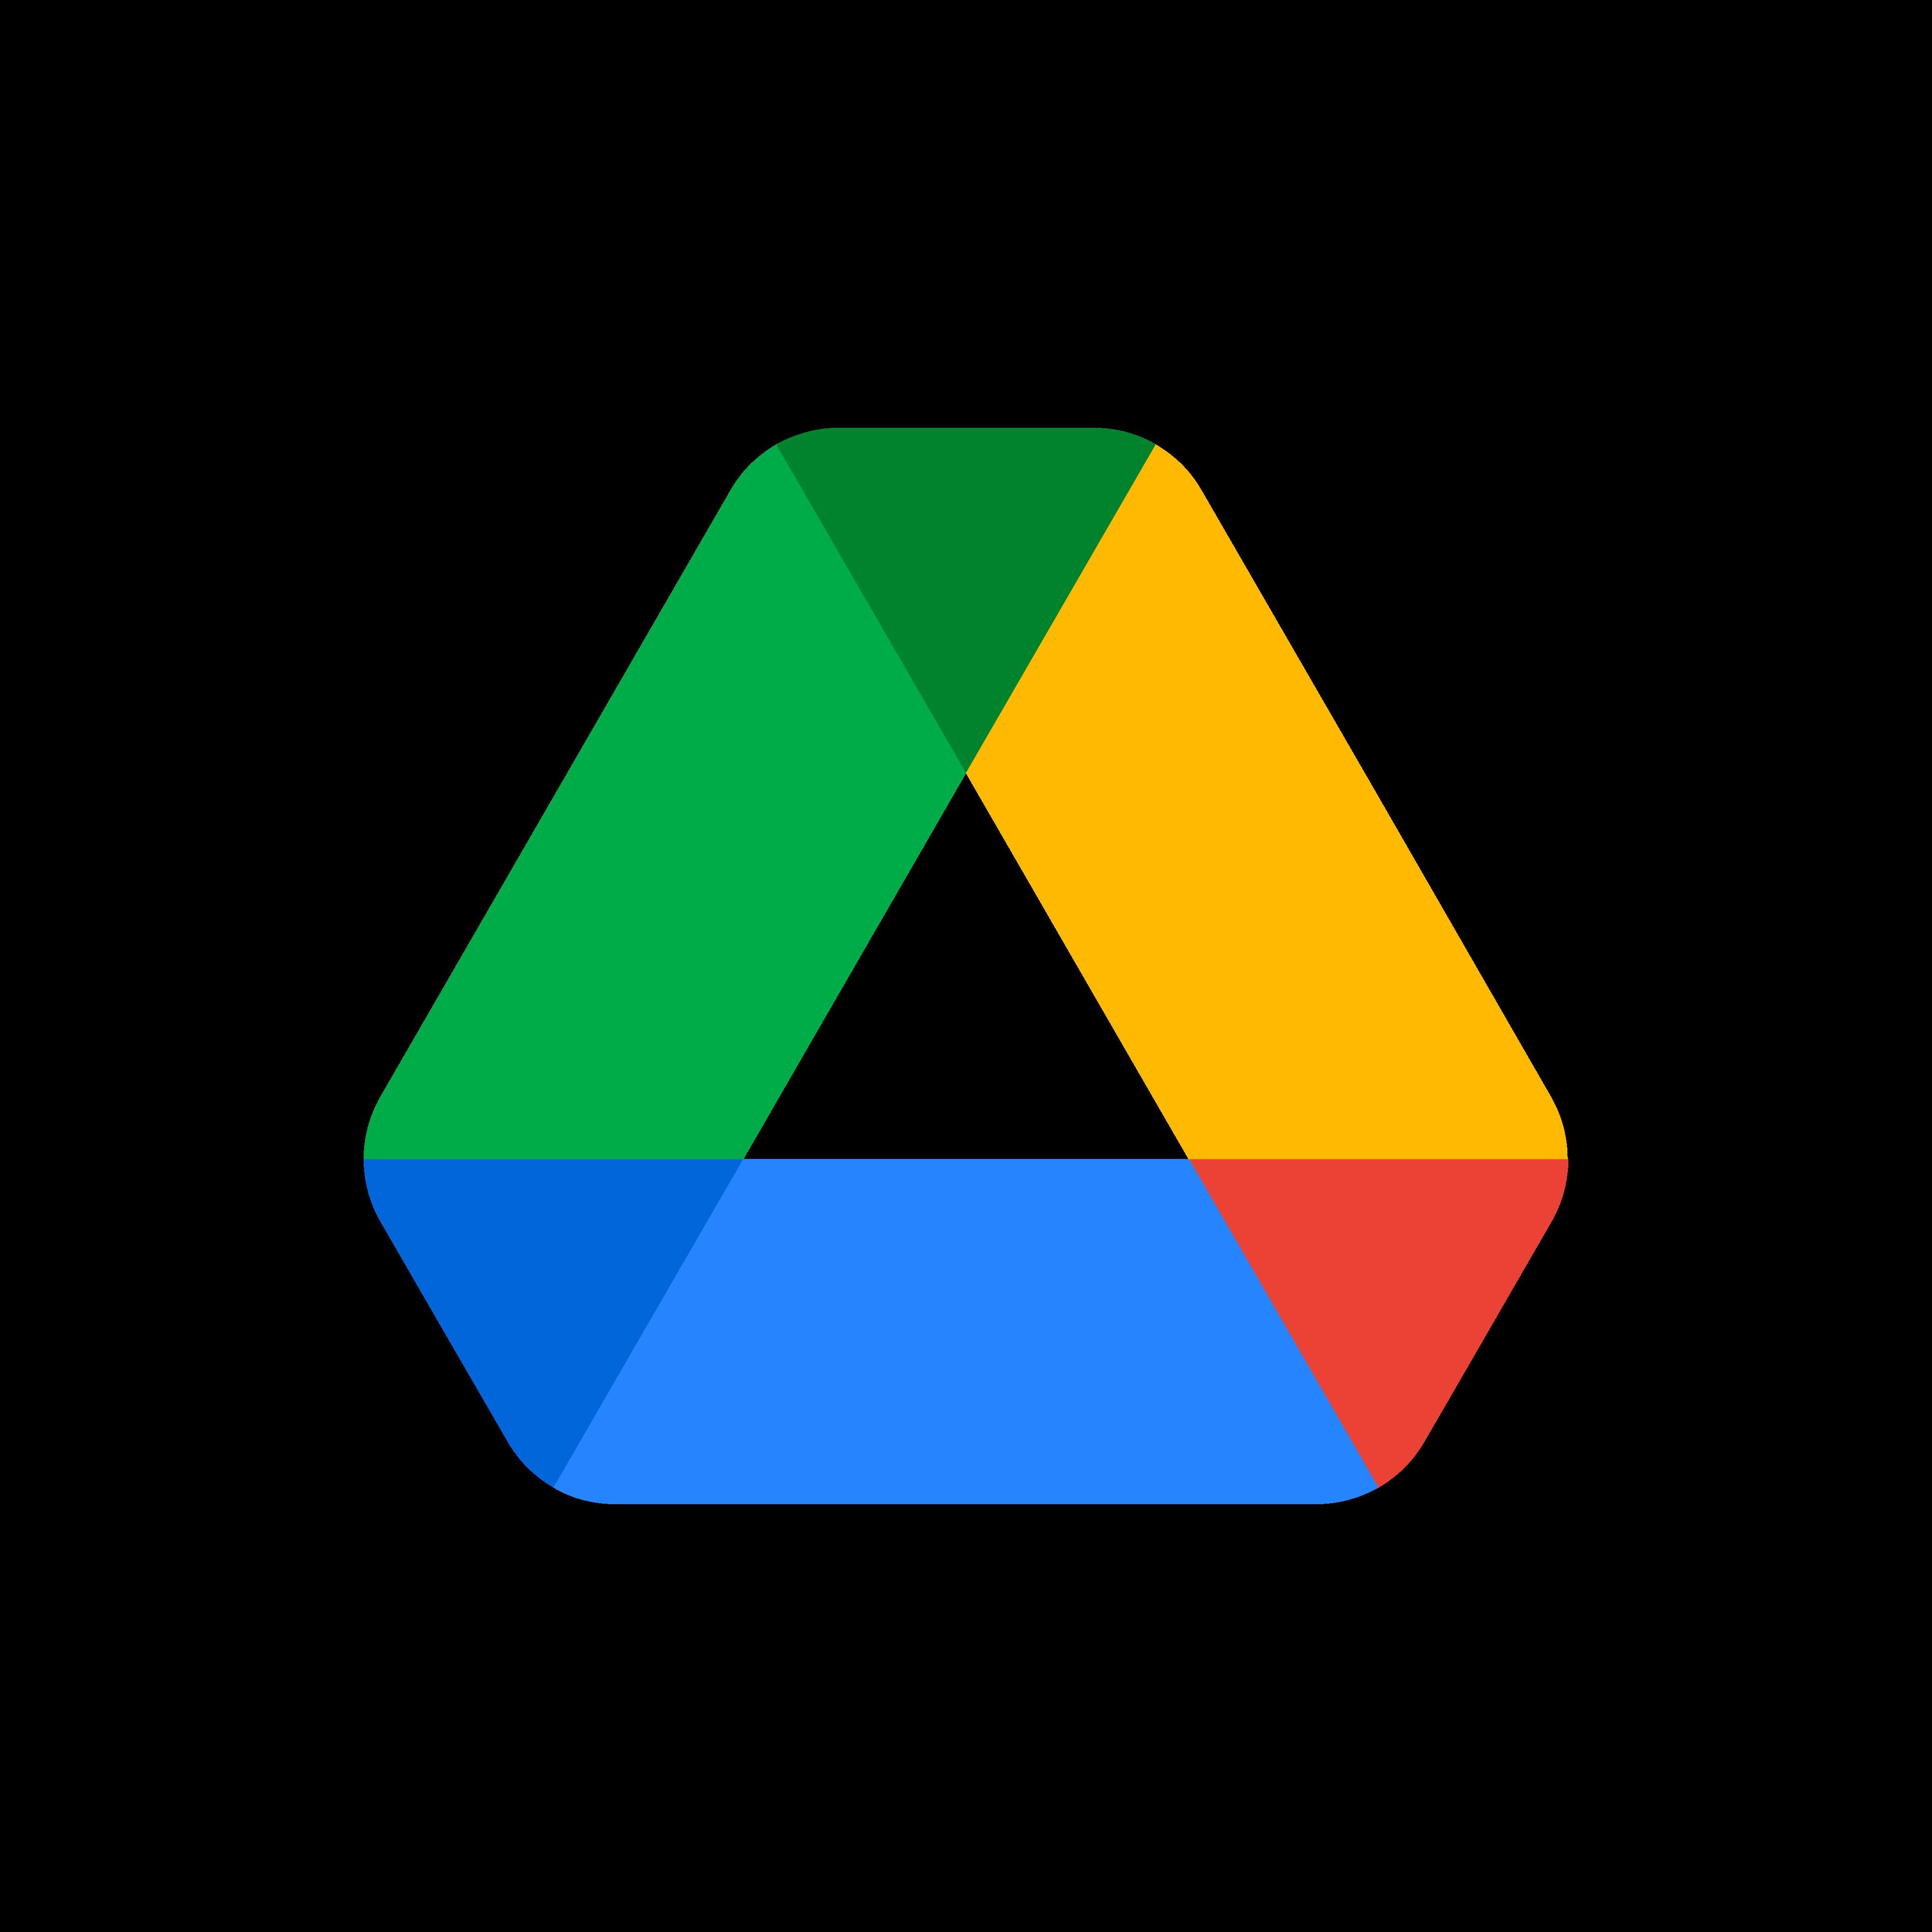 google drive logo 0 1 - Google Drive Logo